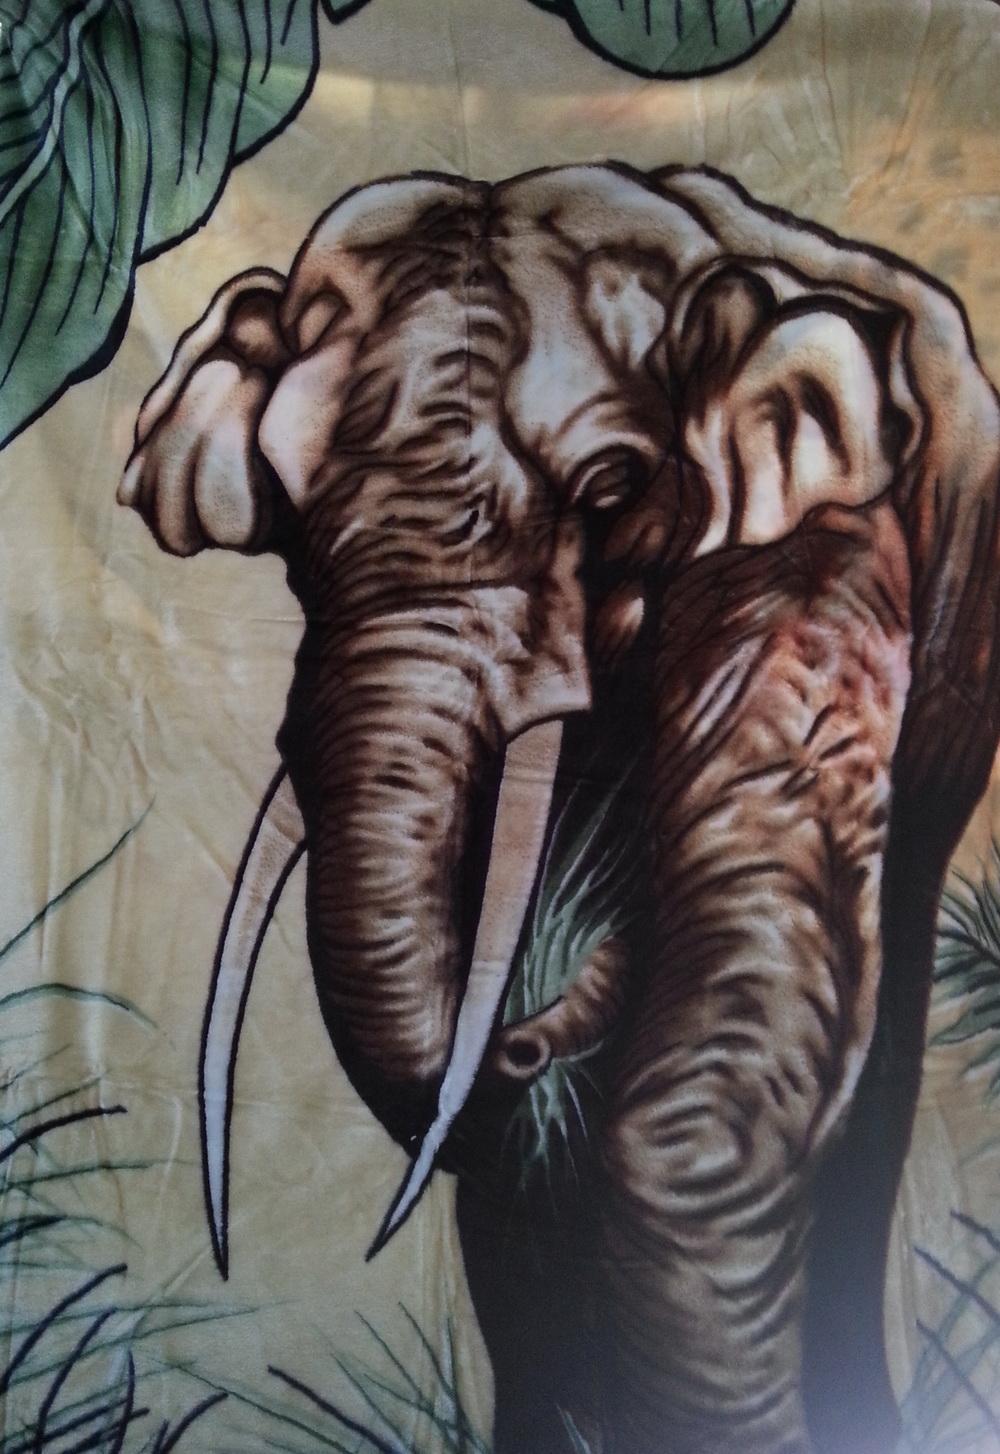 xxl tagesdecke kuscheldecke wohndecke decke motiv elefant 200x240cm wd 116 ebay. Black Bedroom Furniture Sets. Home Design Ideas